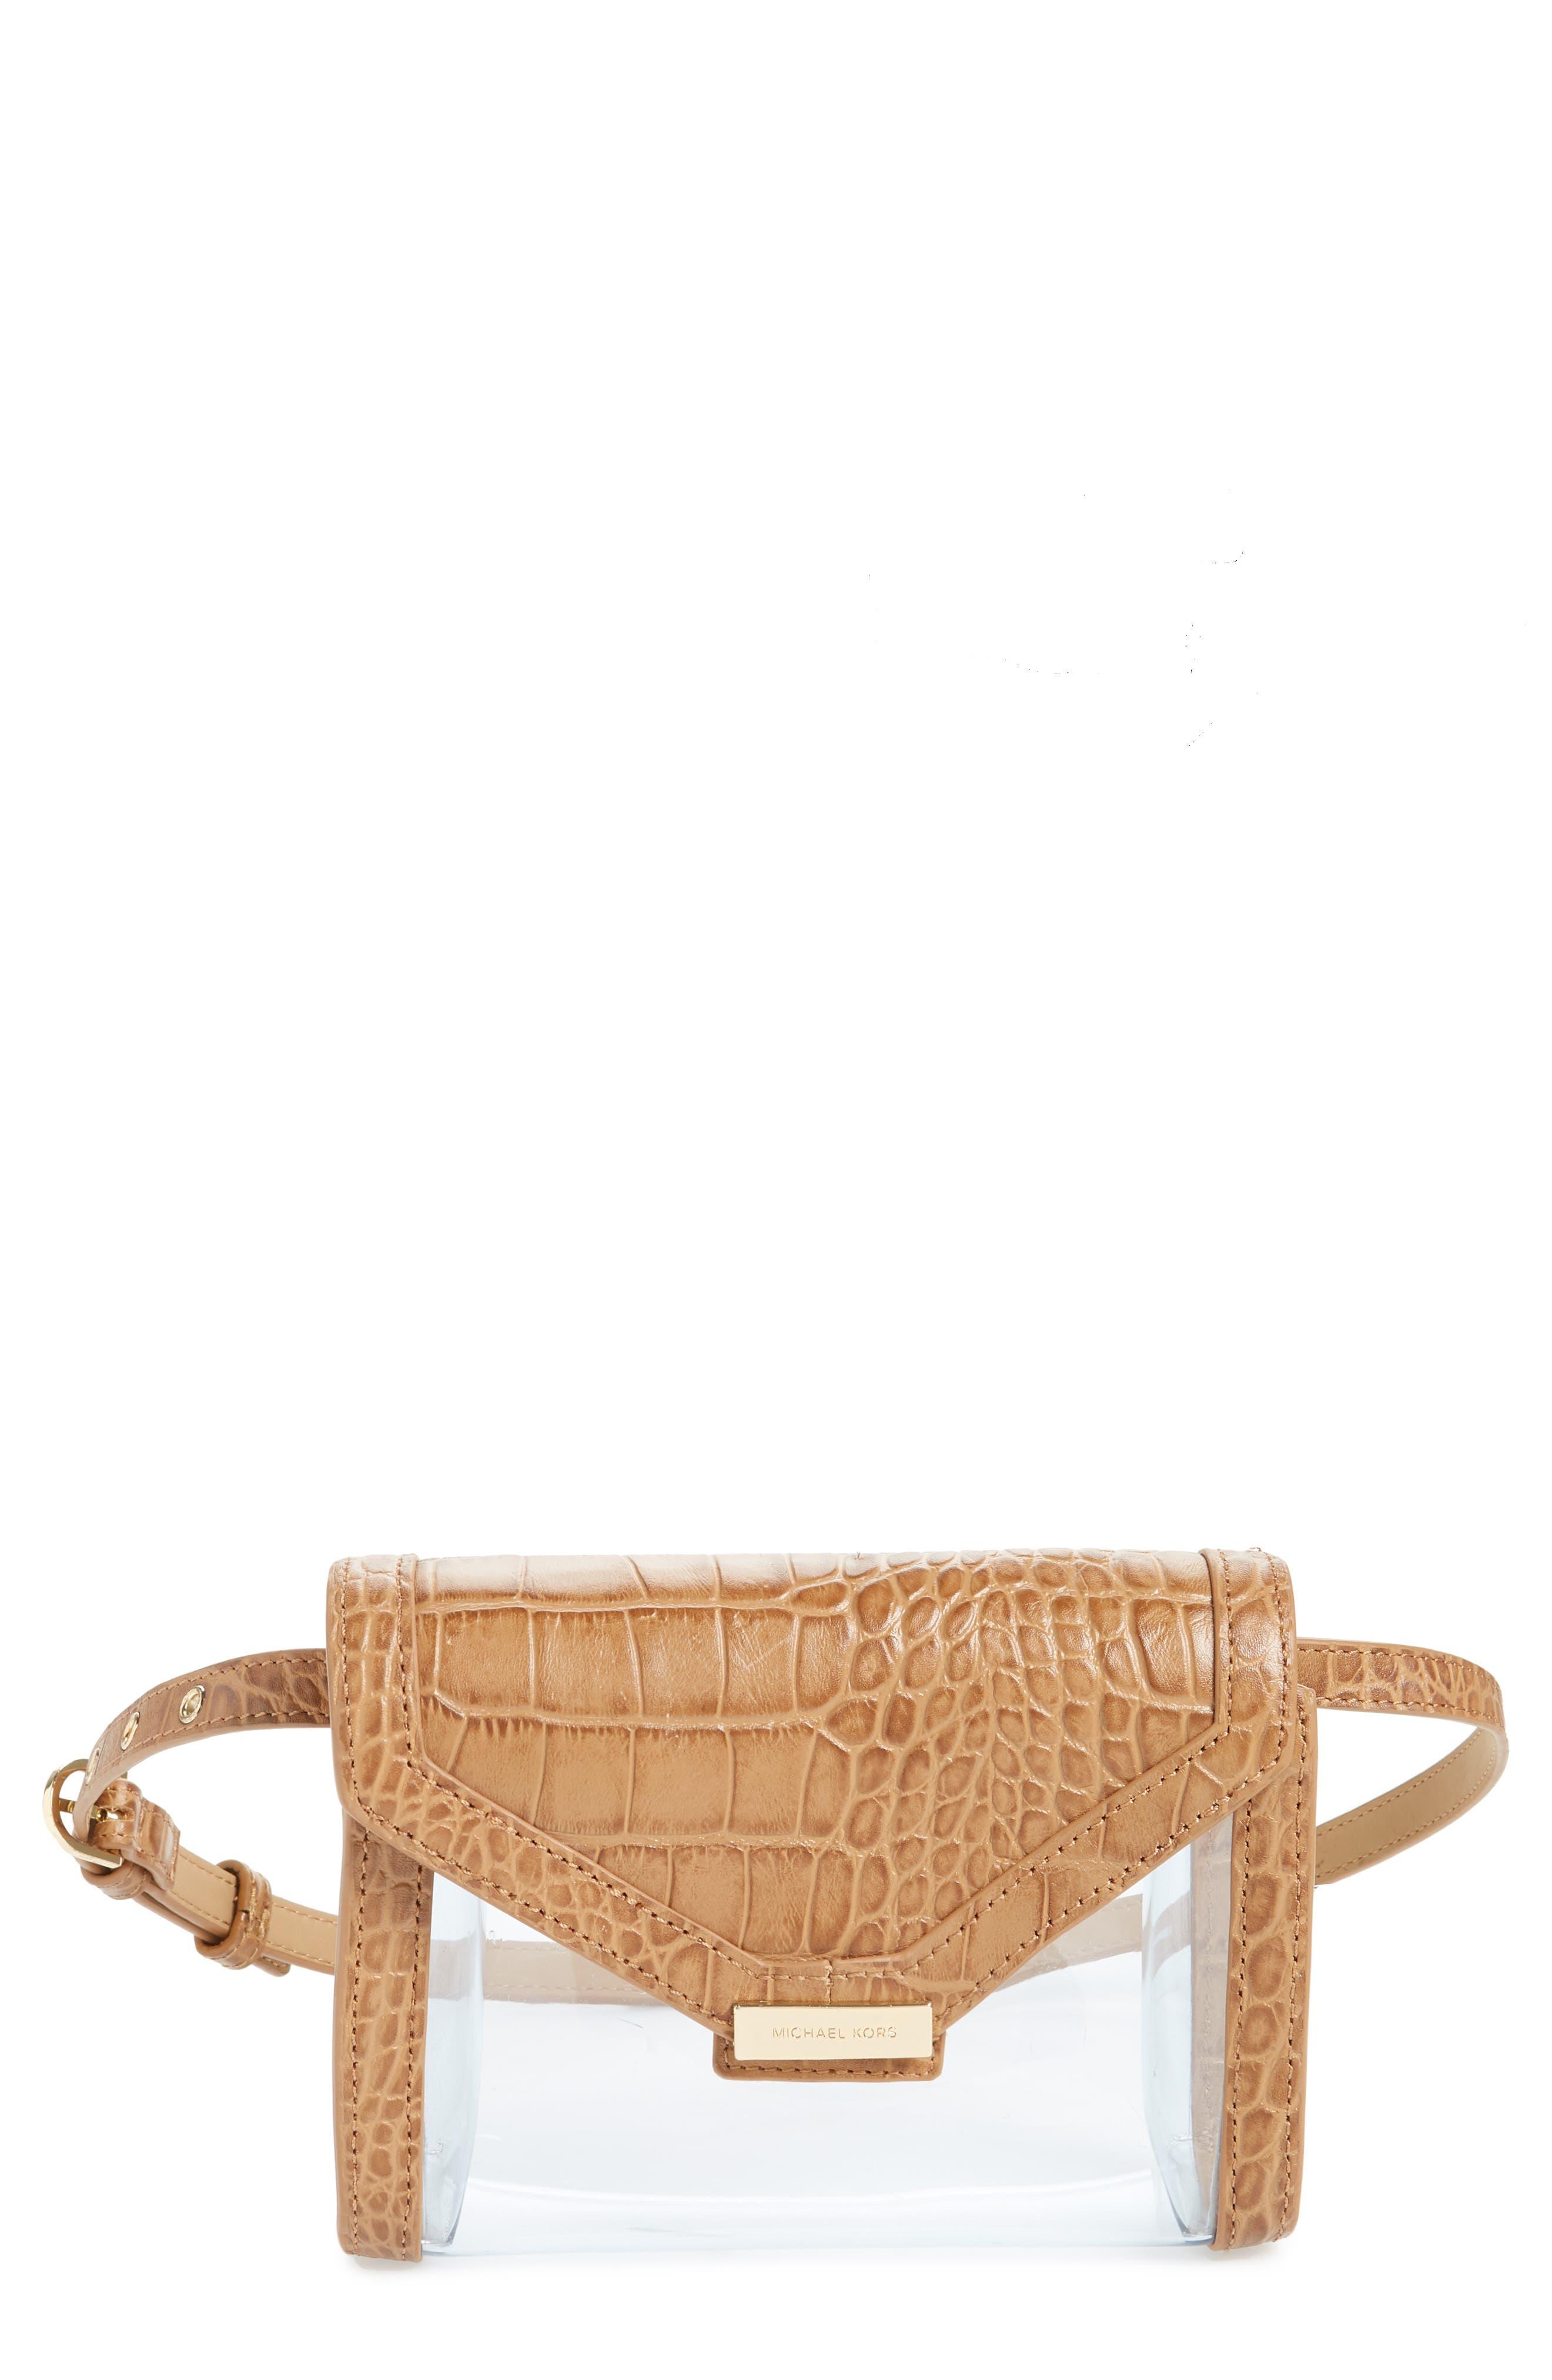 bed2f182503c michael kors handbags | Nordstrom